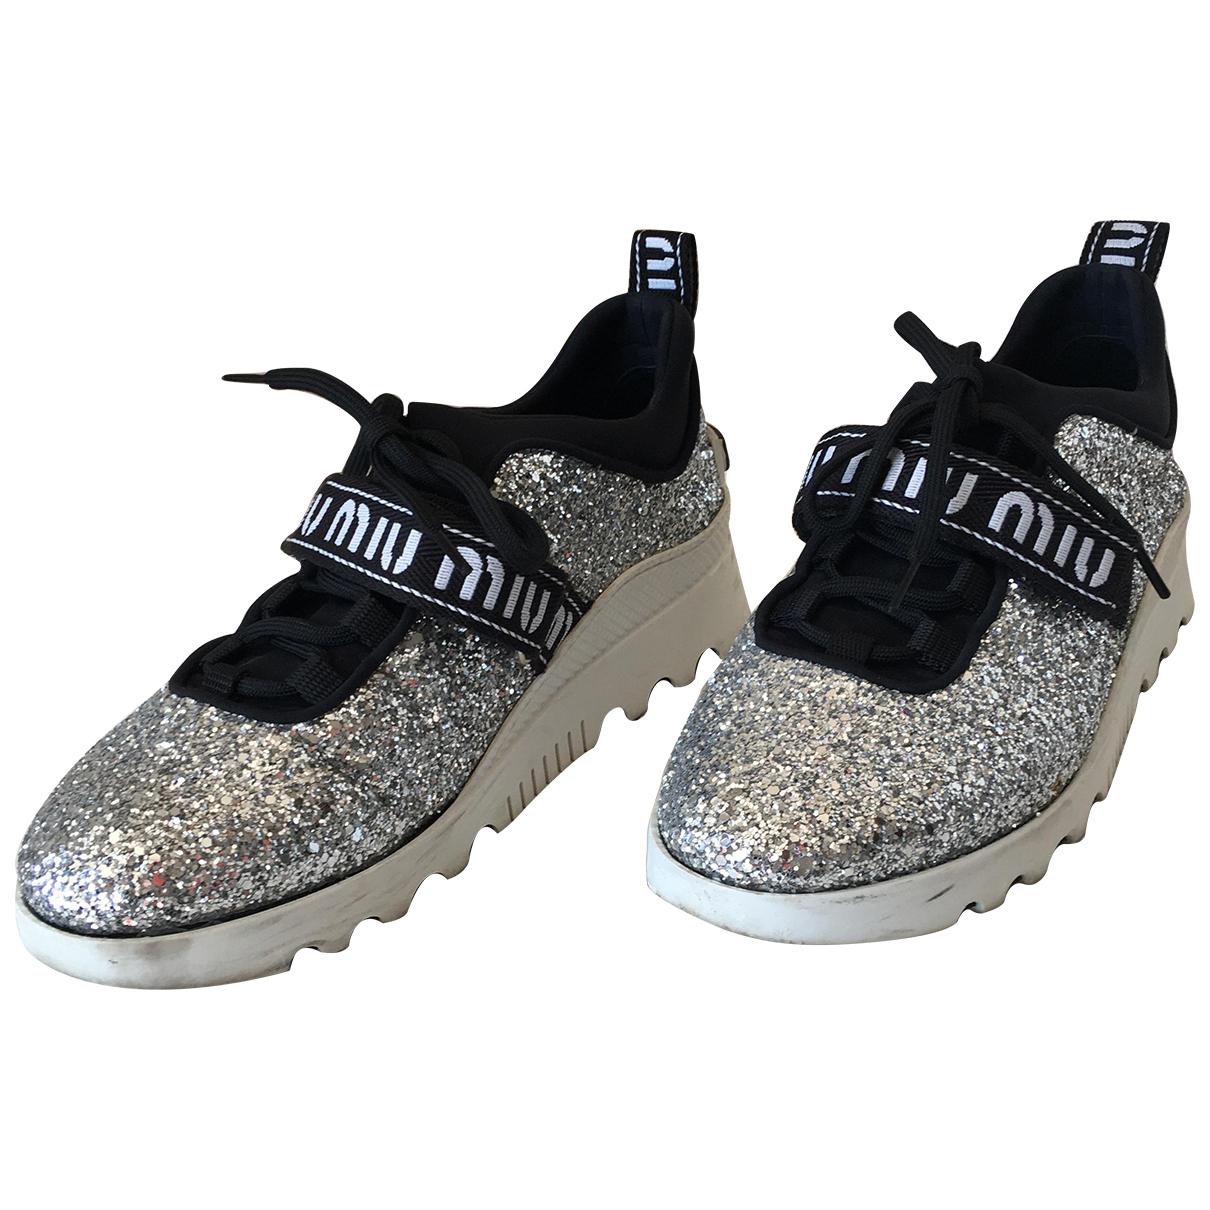 Miu Miu \N Sneakers in  Silber Mit Pailletten